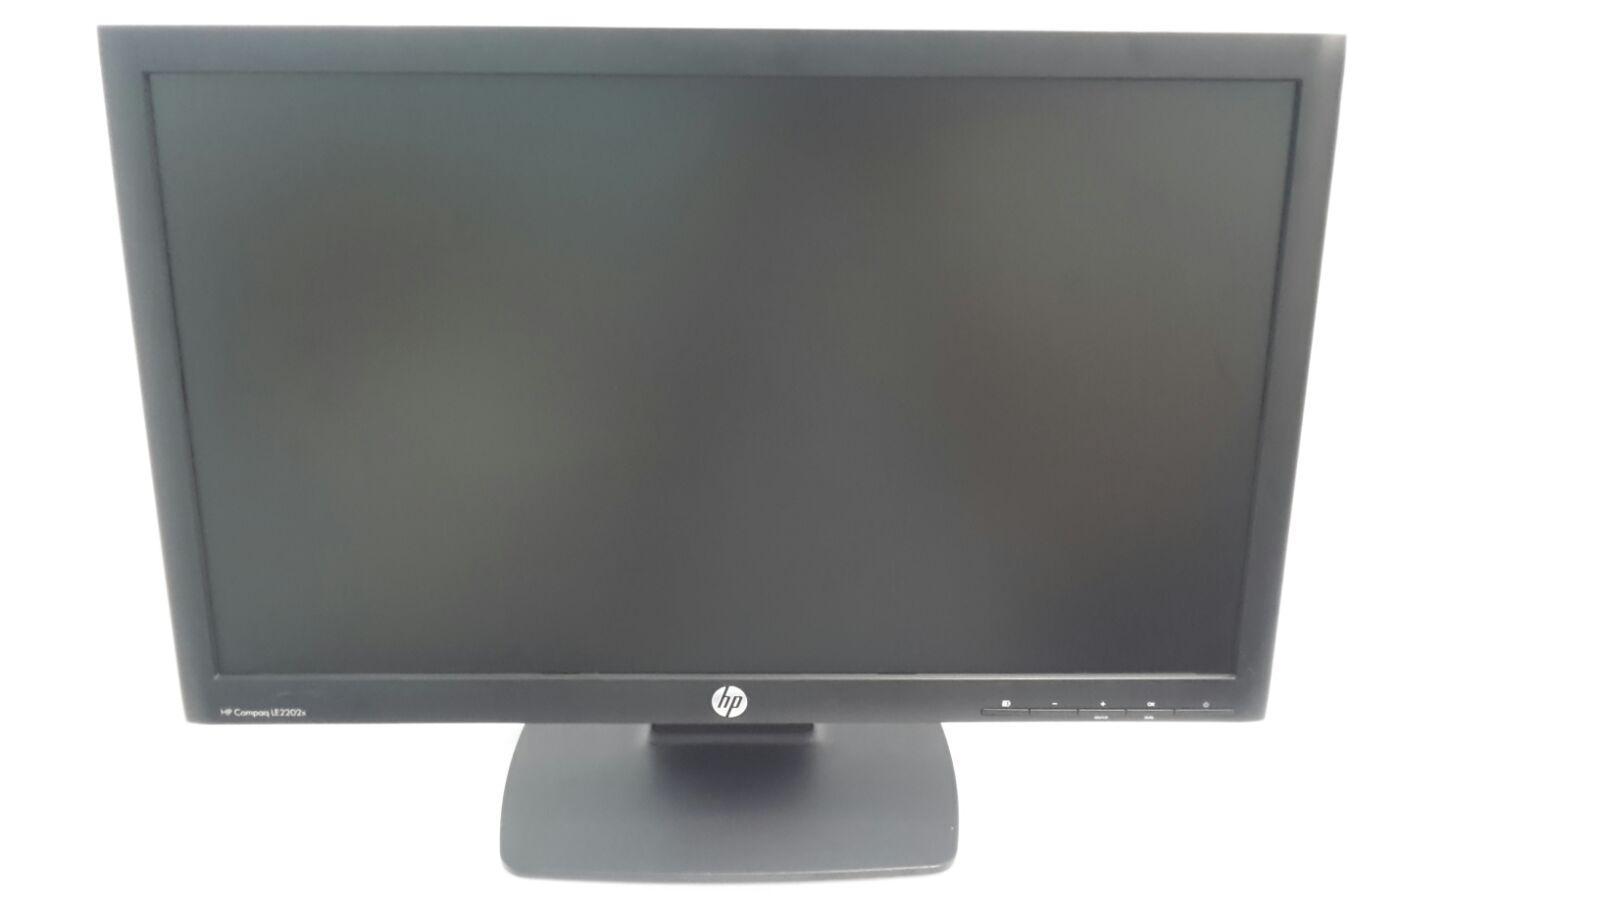 HP Compaq LE2202x LED Backlit Monitor Windows 7